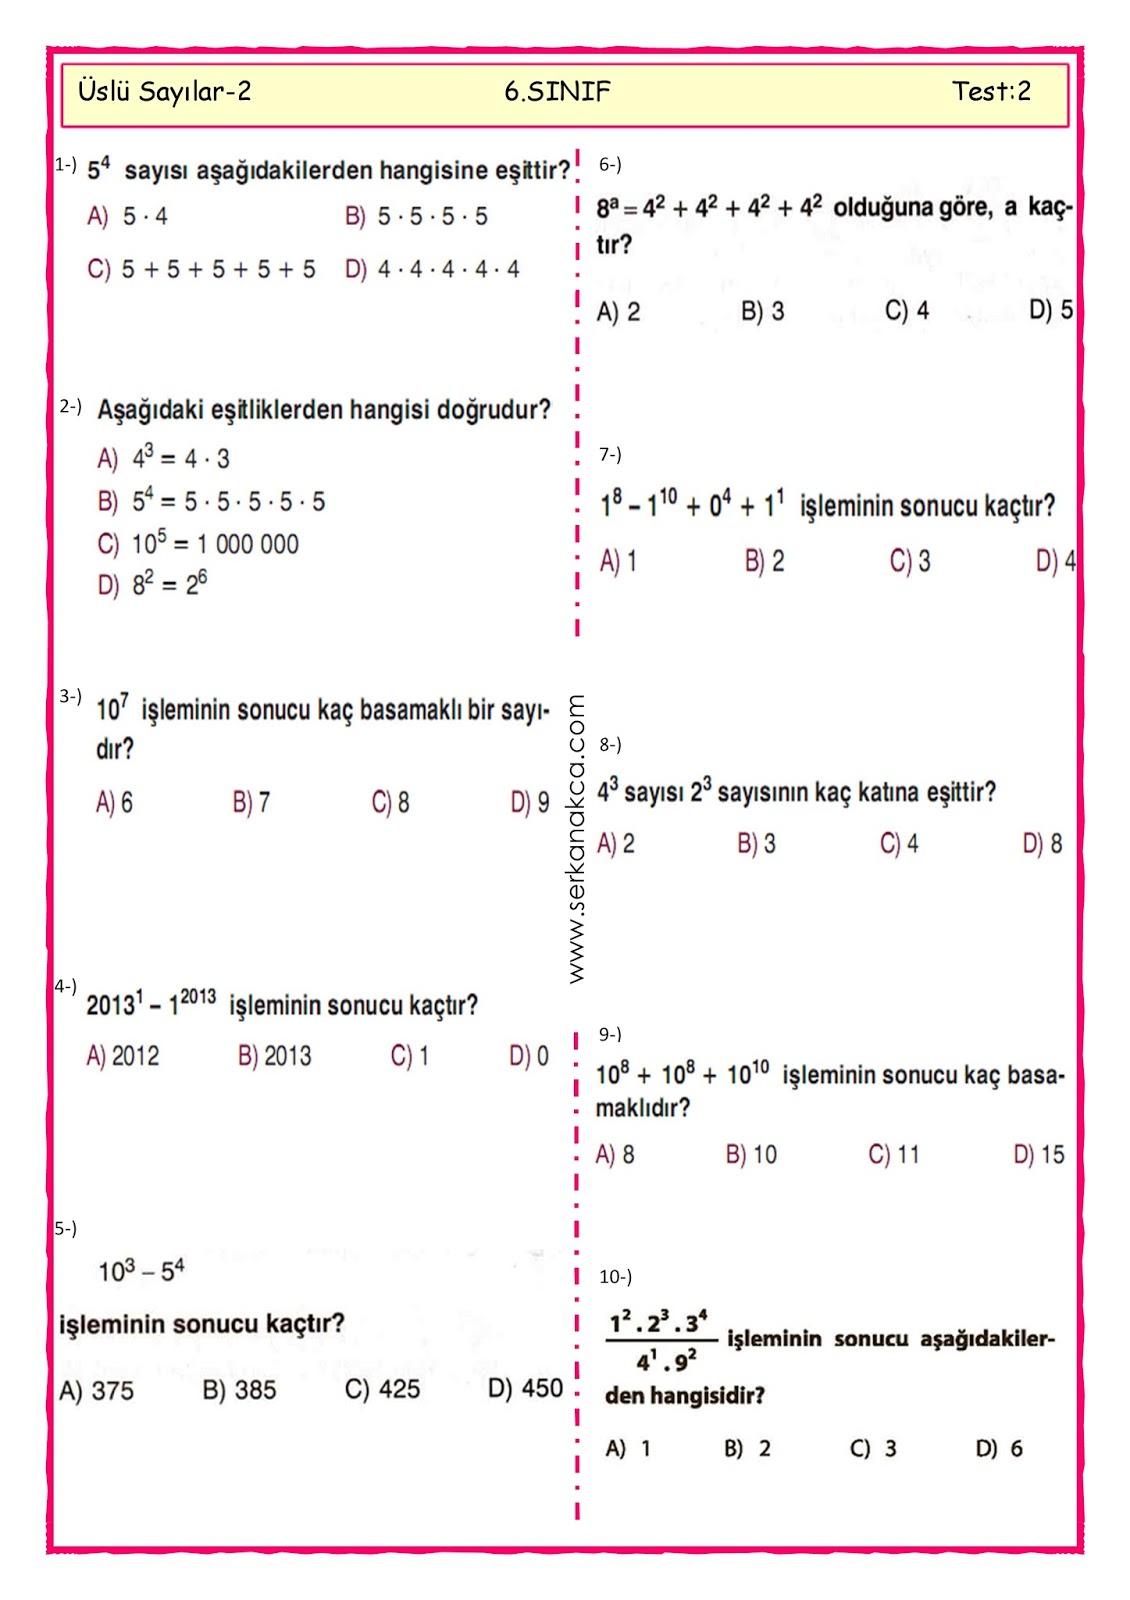 6 Sinif Uslu Sayilar Calisma Kagidi 2 Serkan Akca Matematik